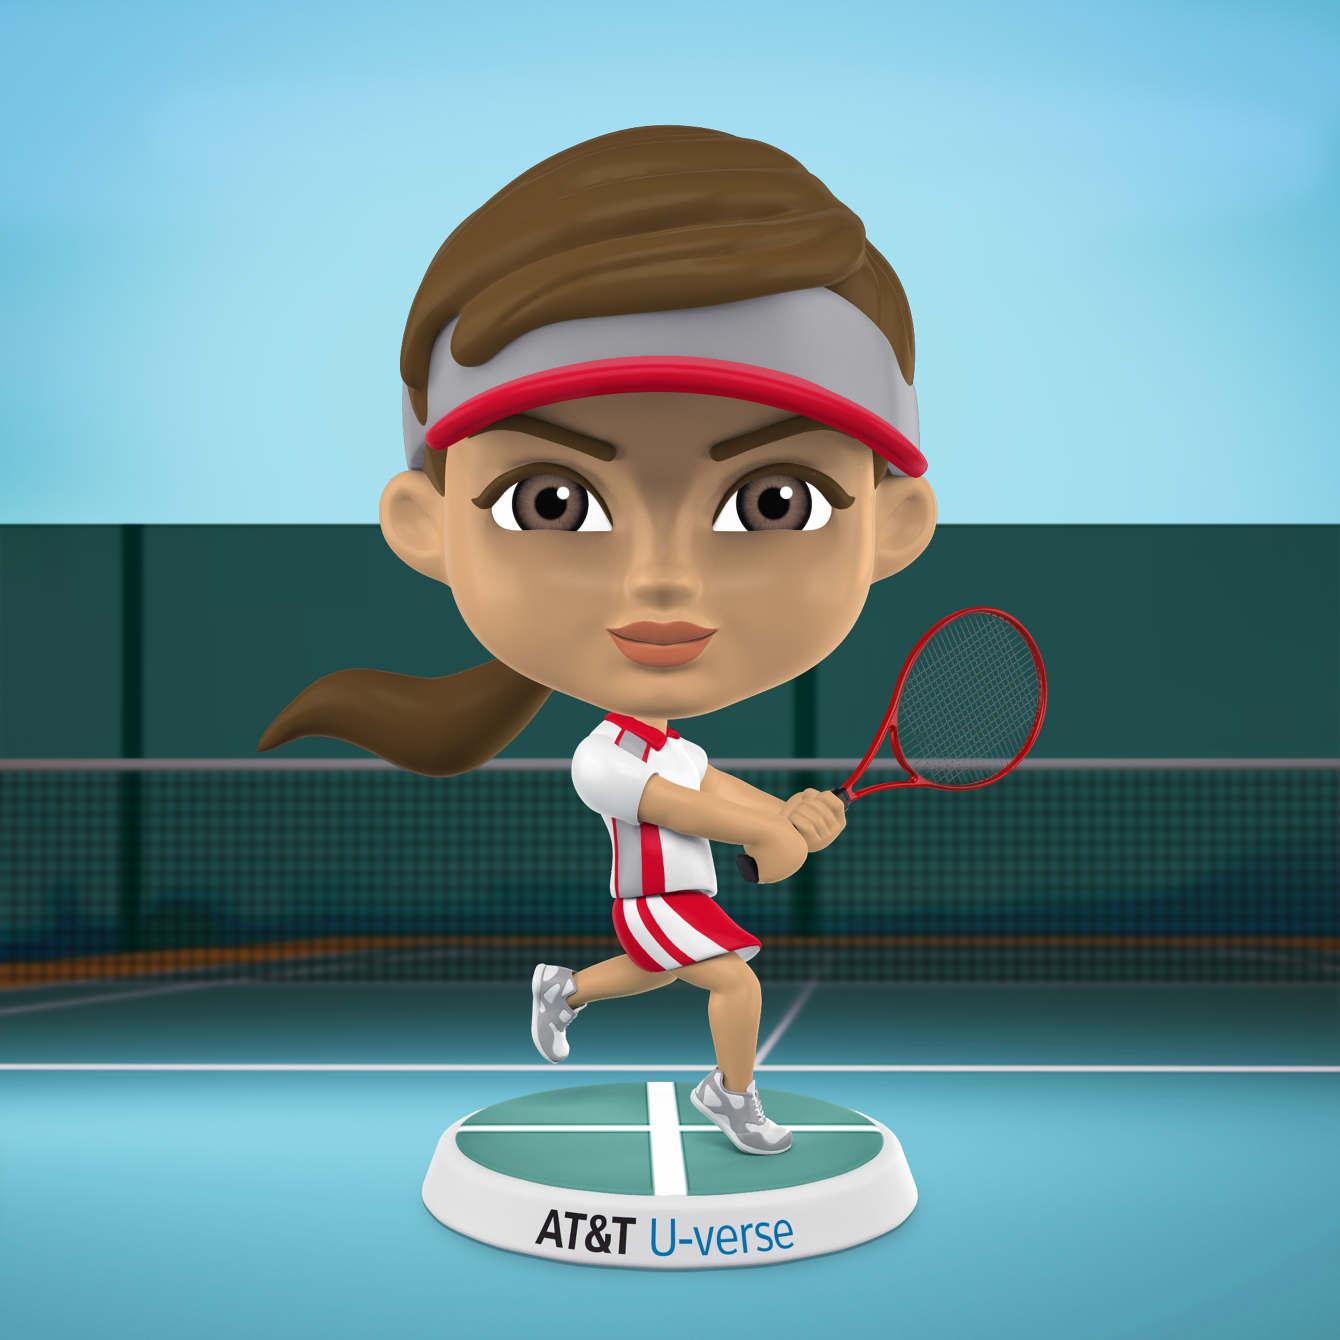 ATT-U-verse-Bobbleheads-Tennis_W_1340_c.jpg